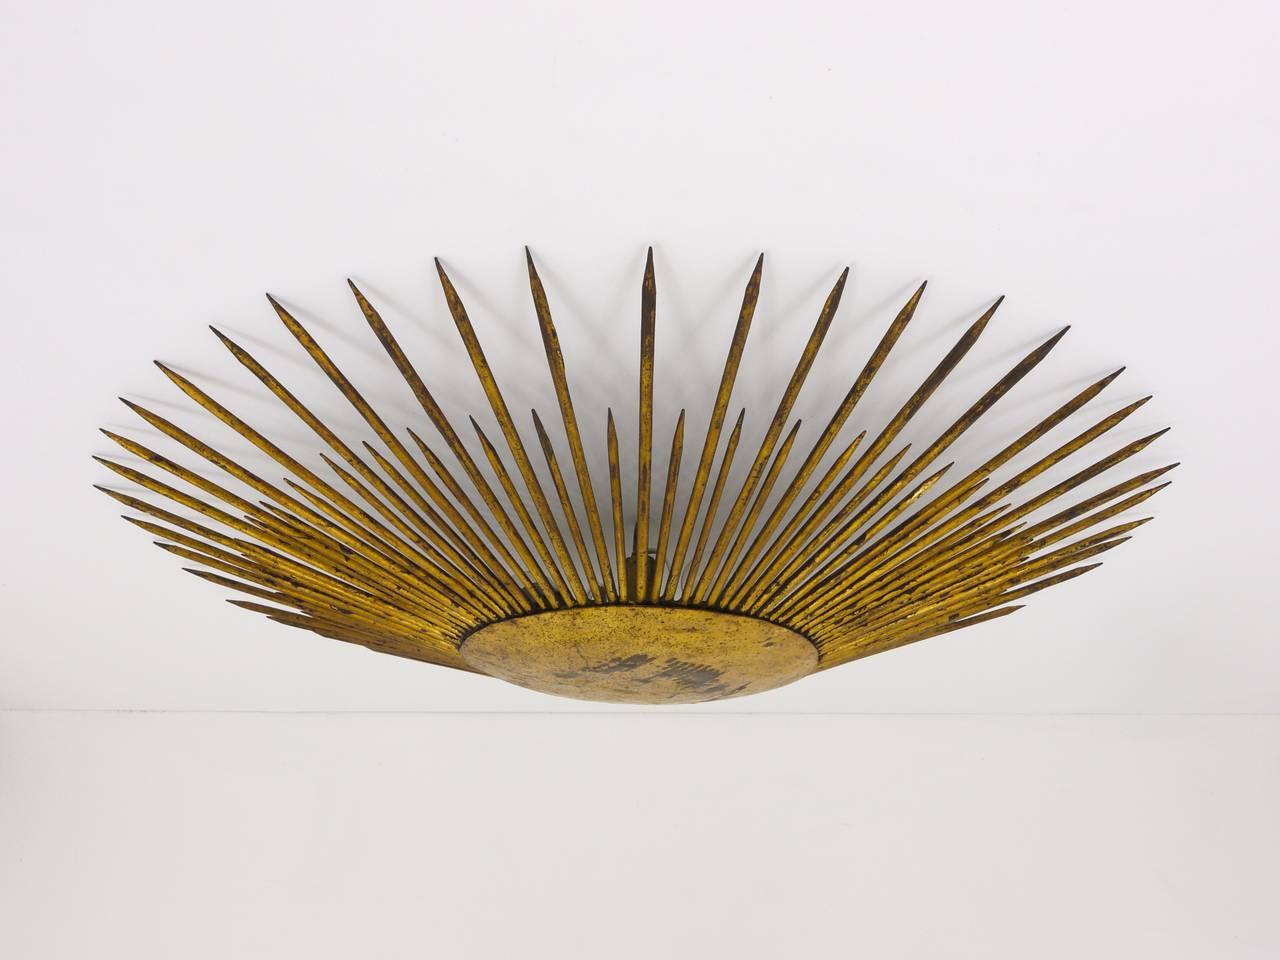 Plafoniere De Metal : French sunburst starburst flush mount plafoniere ceiling lamp